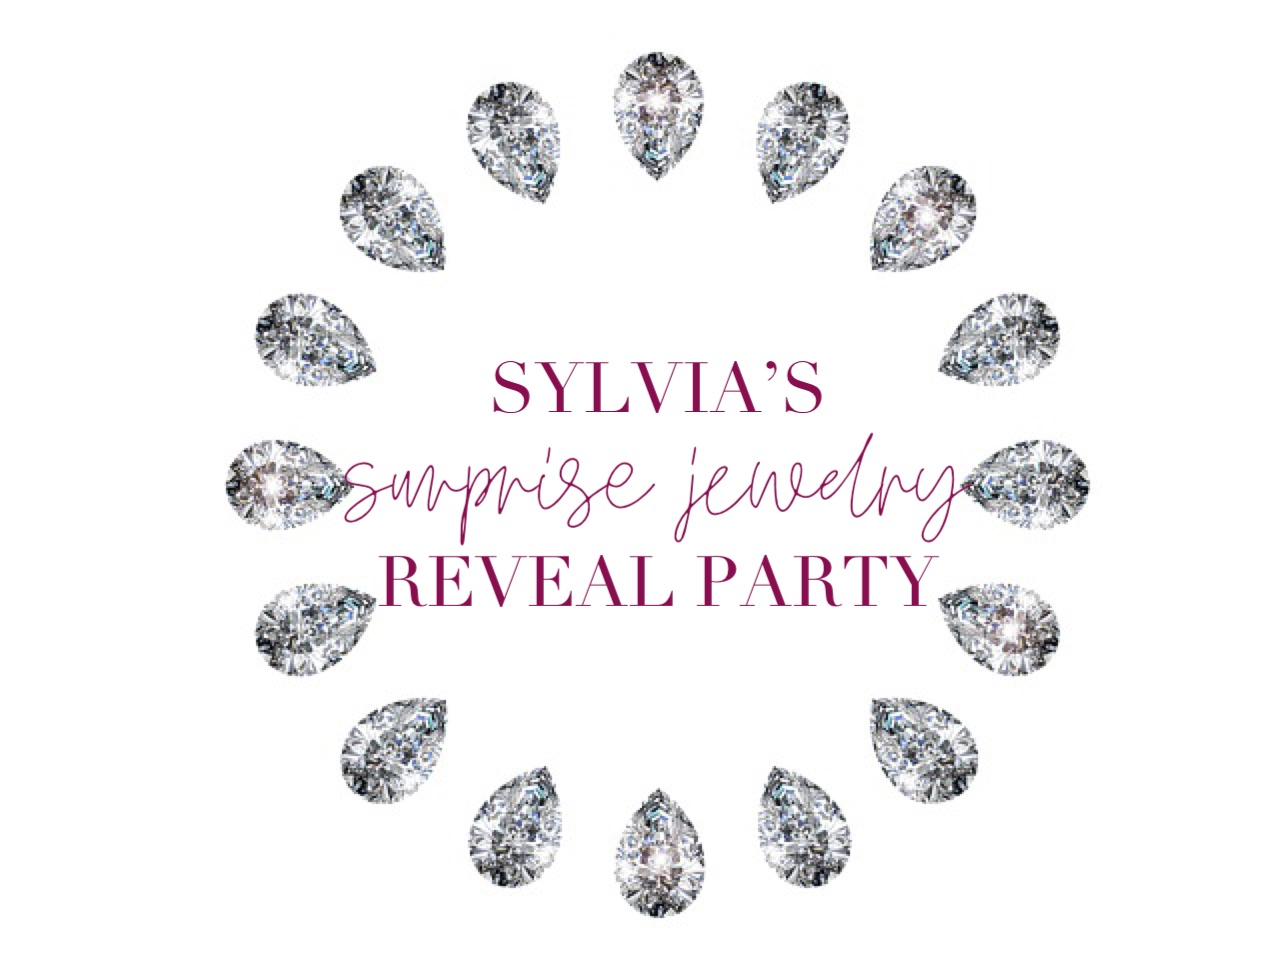 Sylvia's Surprise Jewelry Reveal